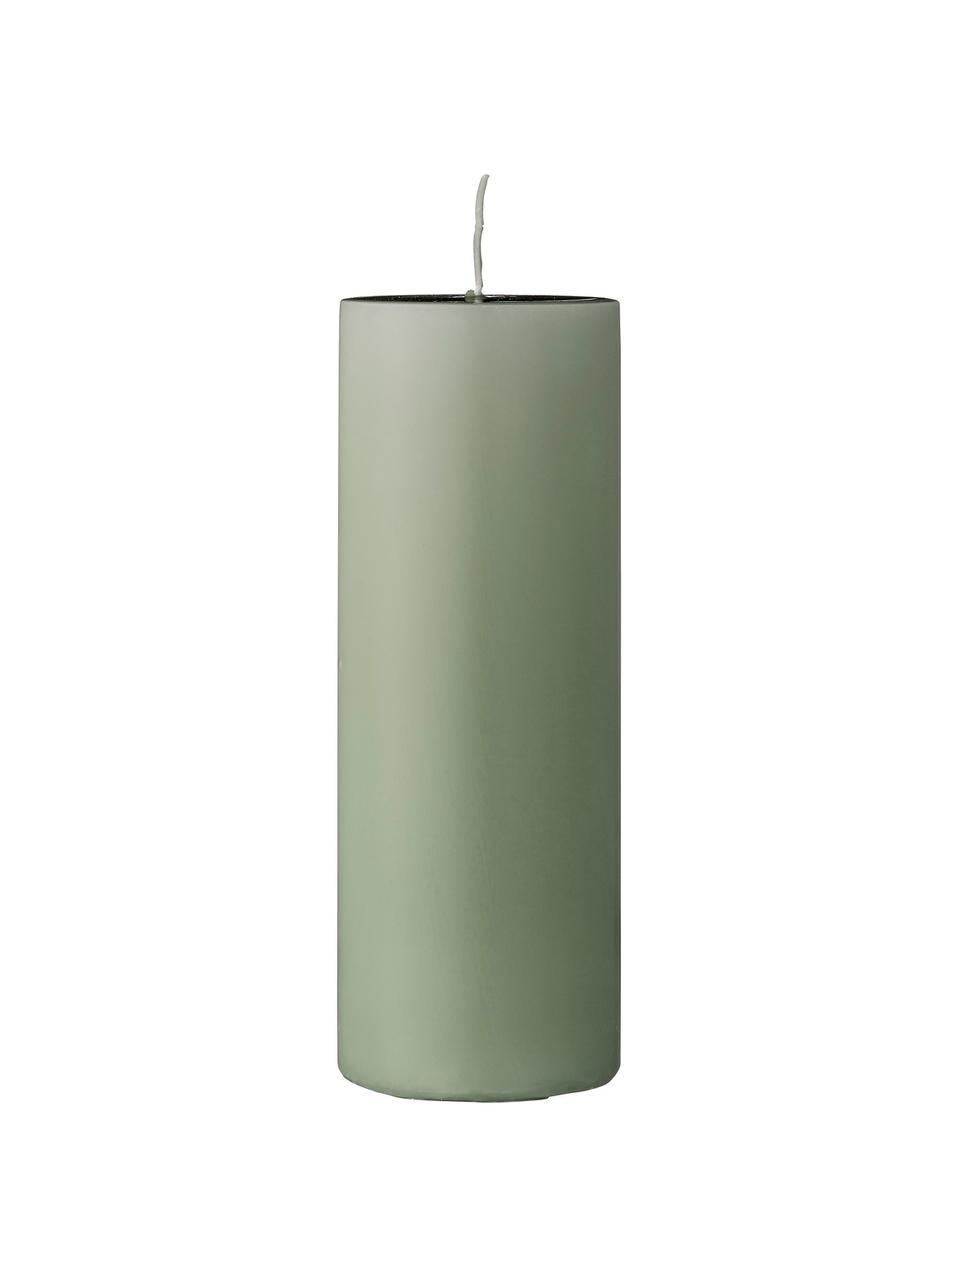 Bougie décorative verte Lulu, Vert clair